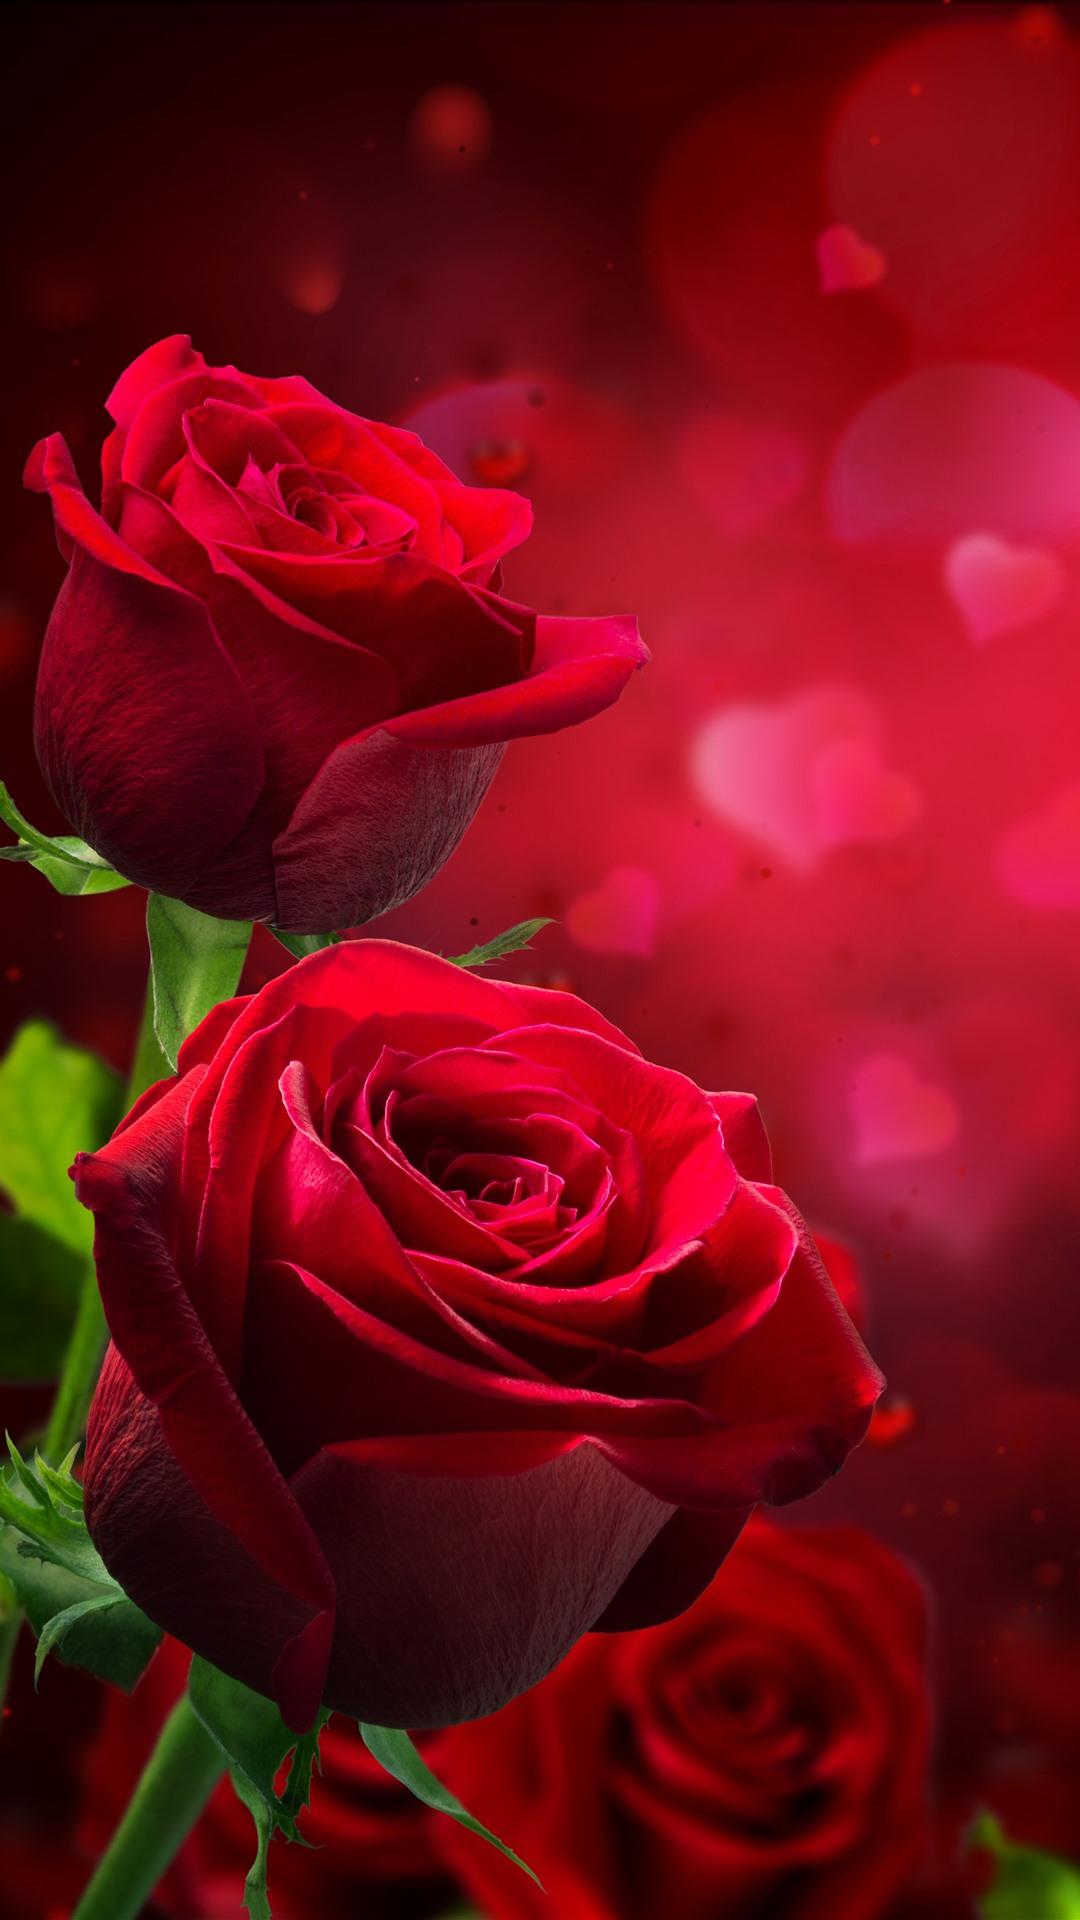 Red Roses Love Hearts Hazy Romantic 1242x2688 Iphone 11 Pro Xs